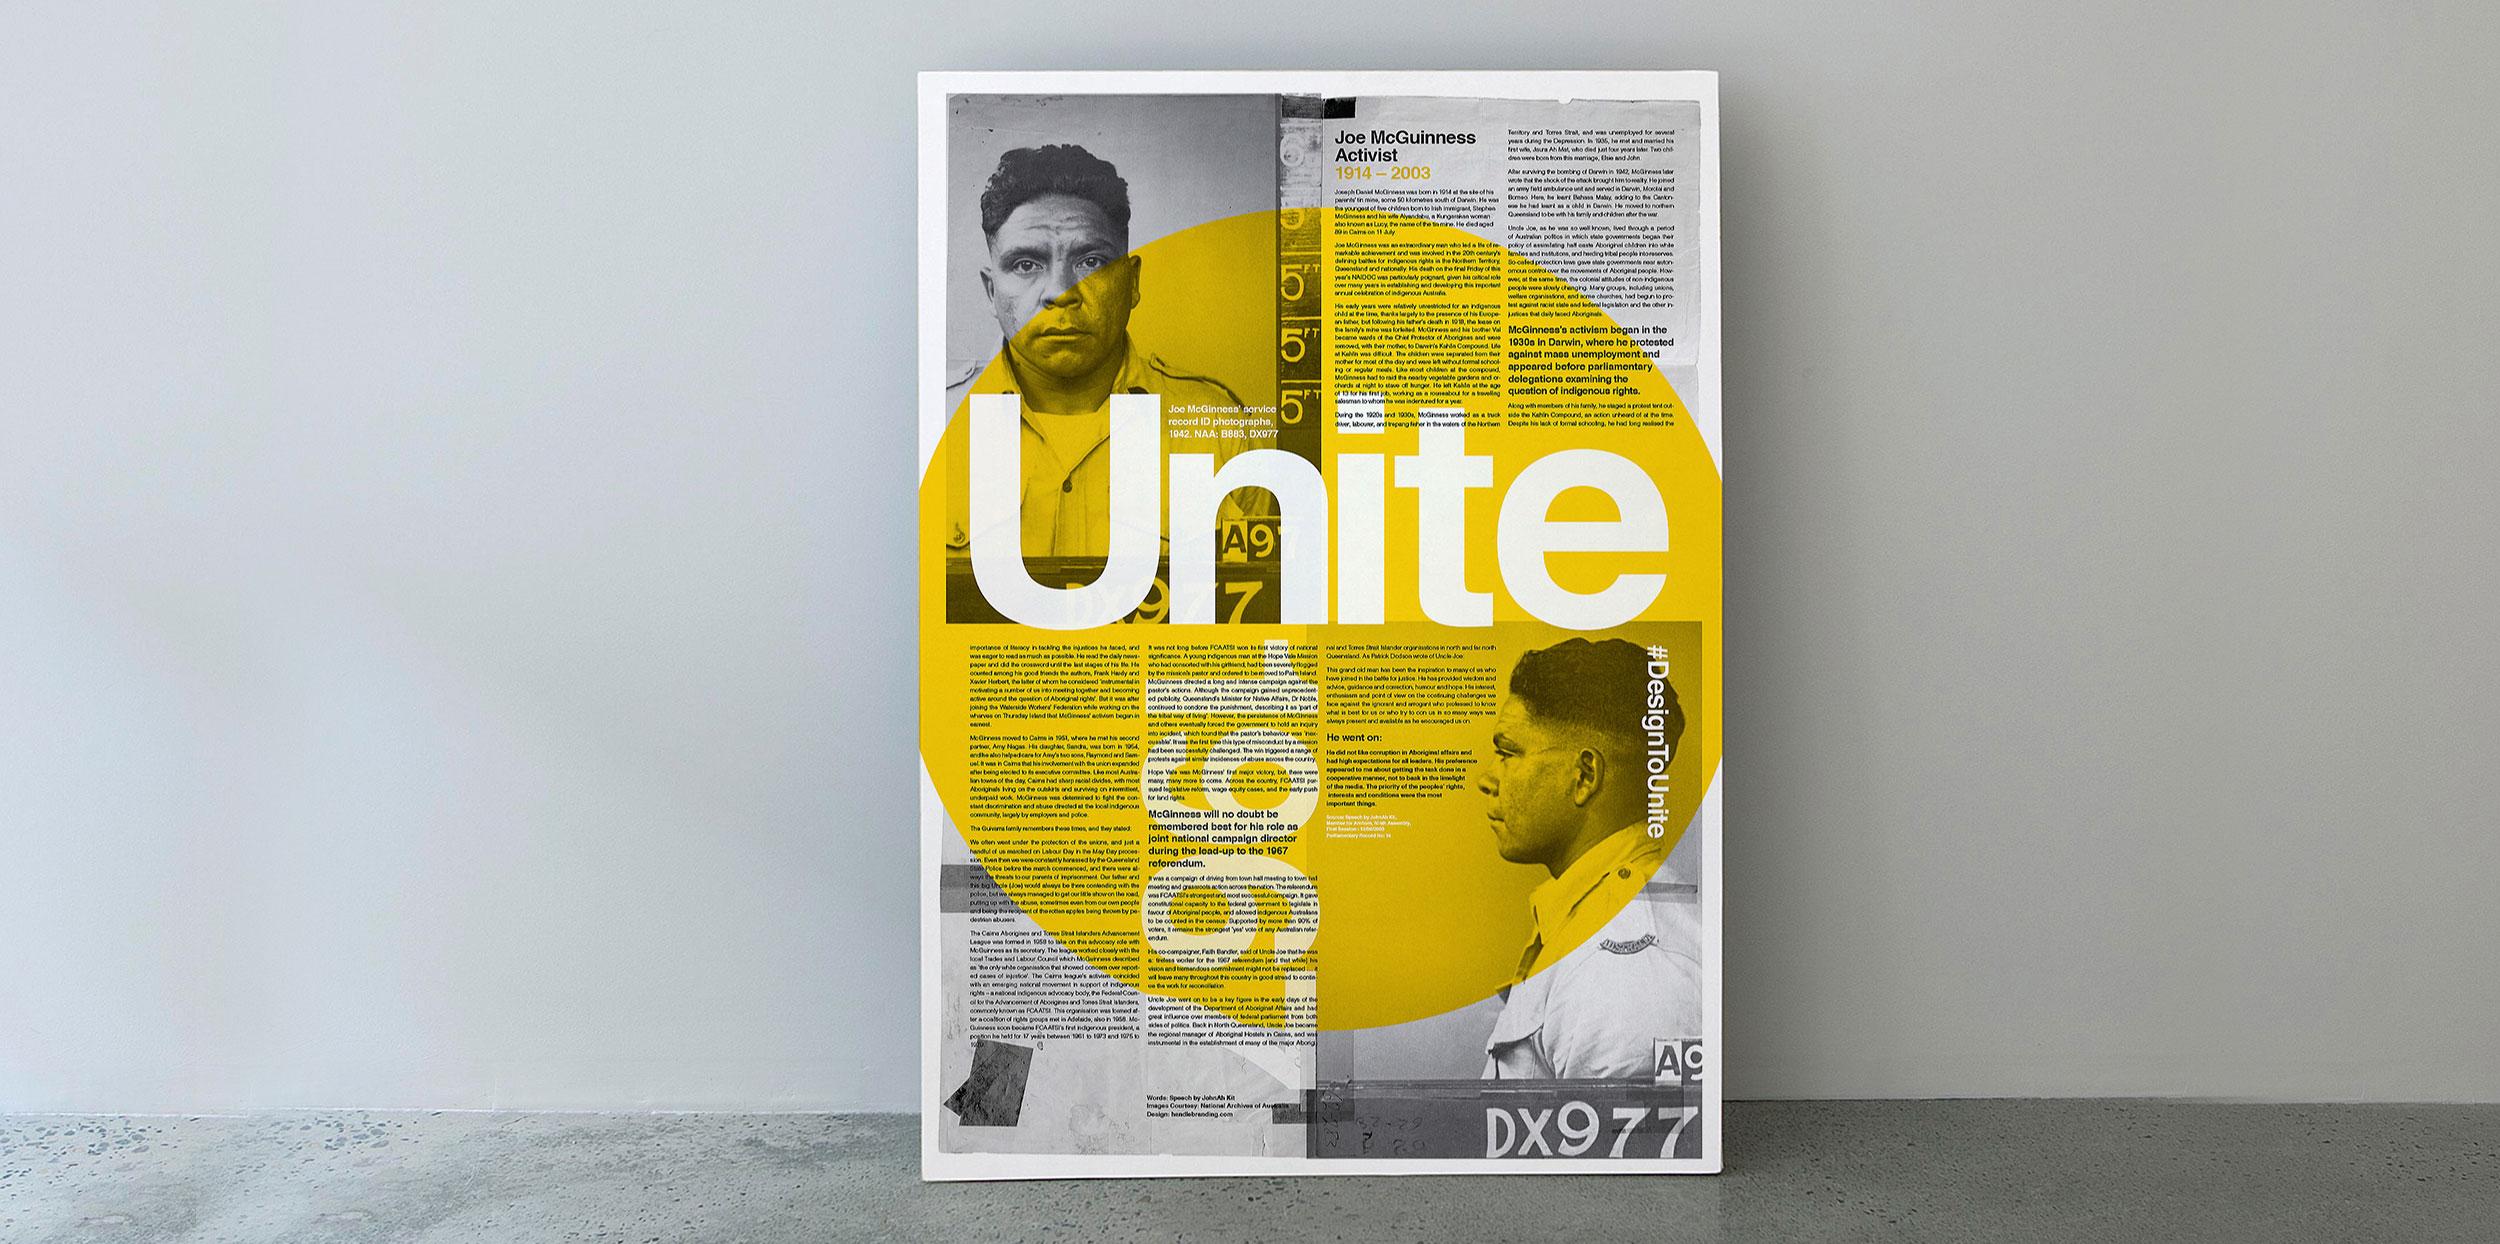 Handle-Sydney-Branding_Website-Poster-Design_02.jpg